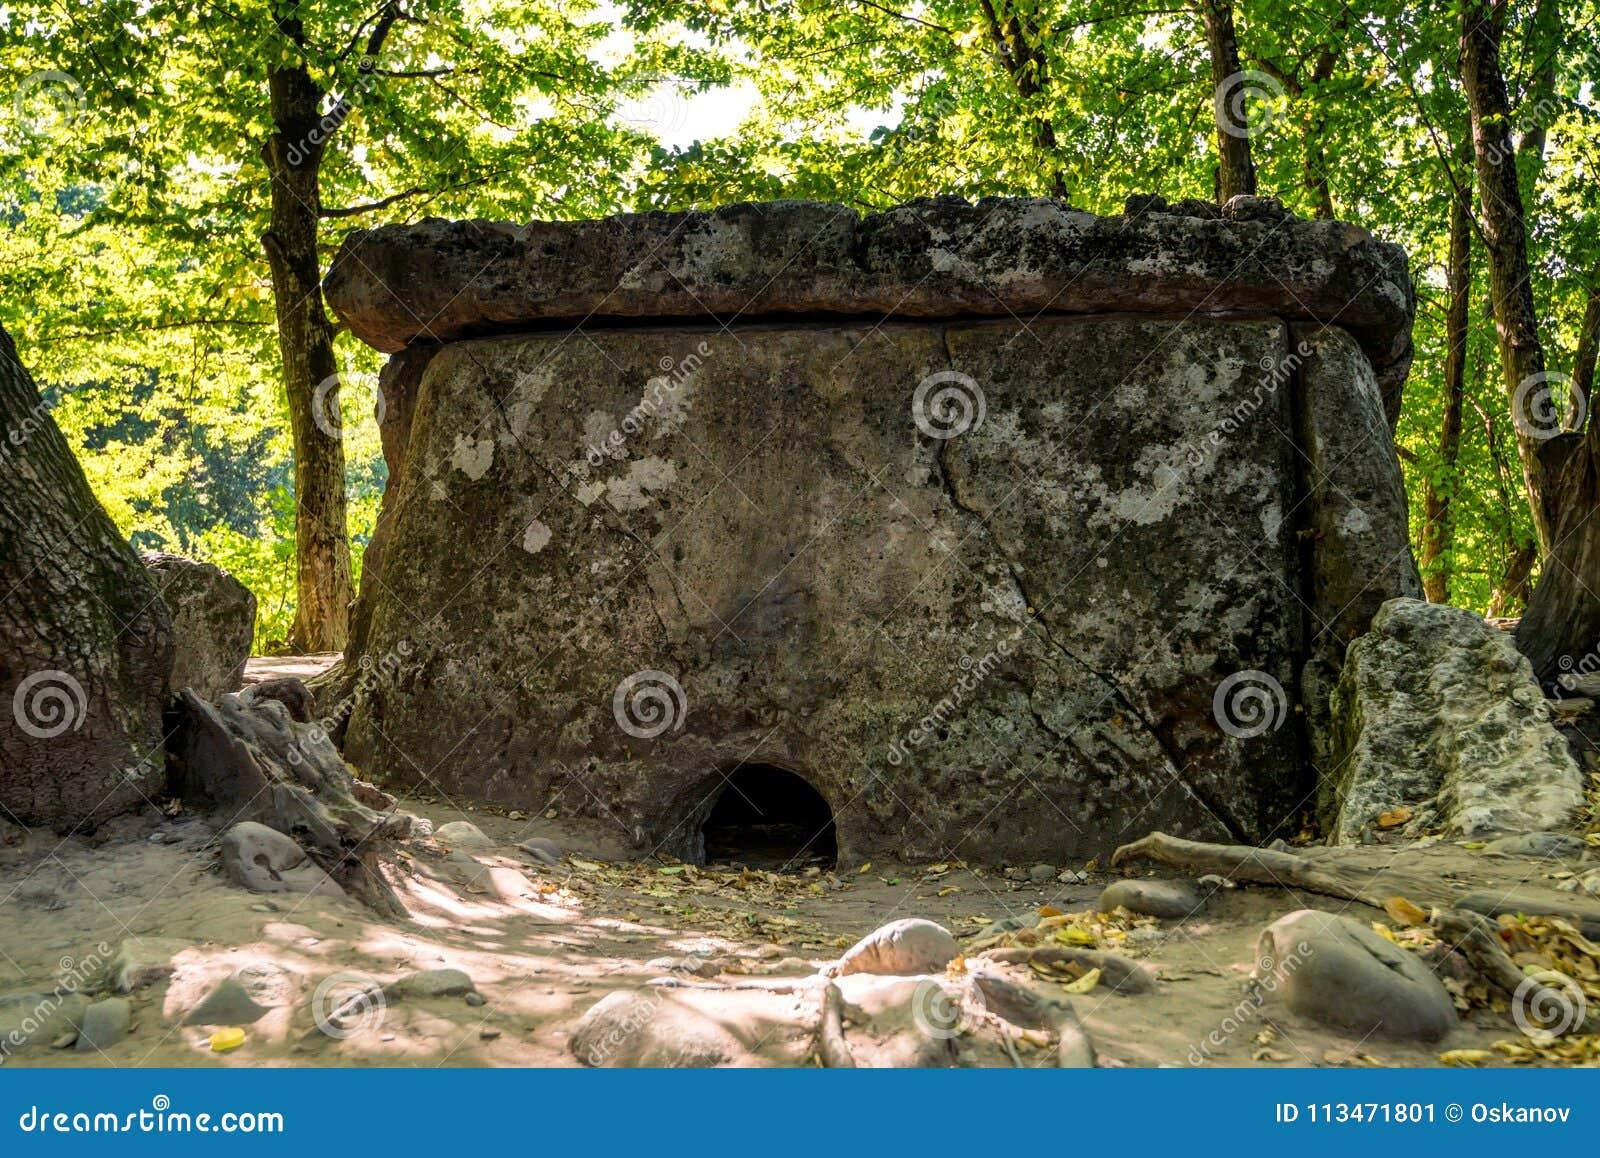 Kaukasus dolmen i skog